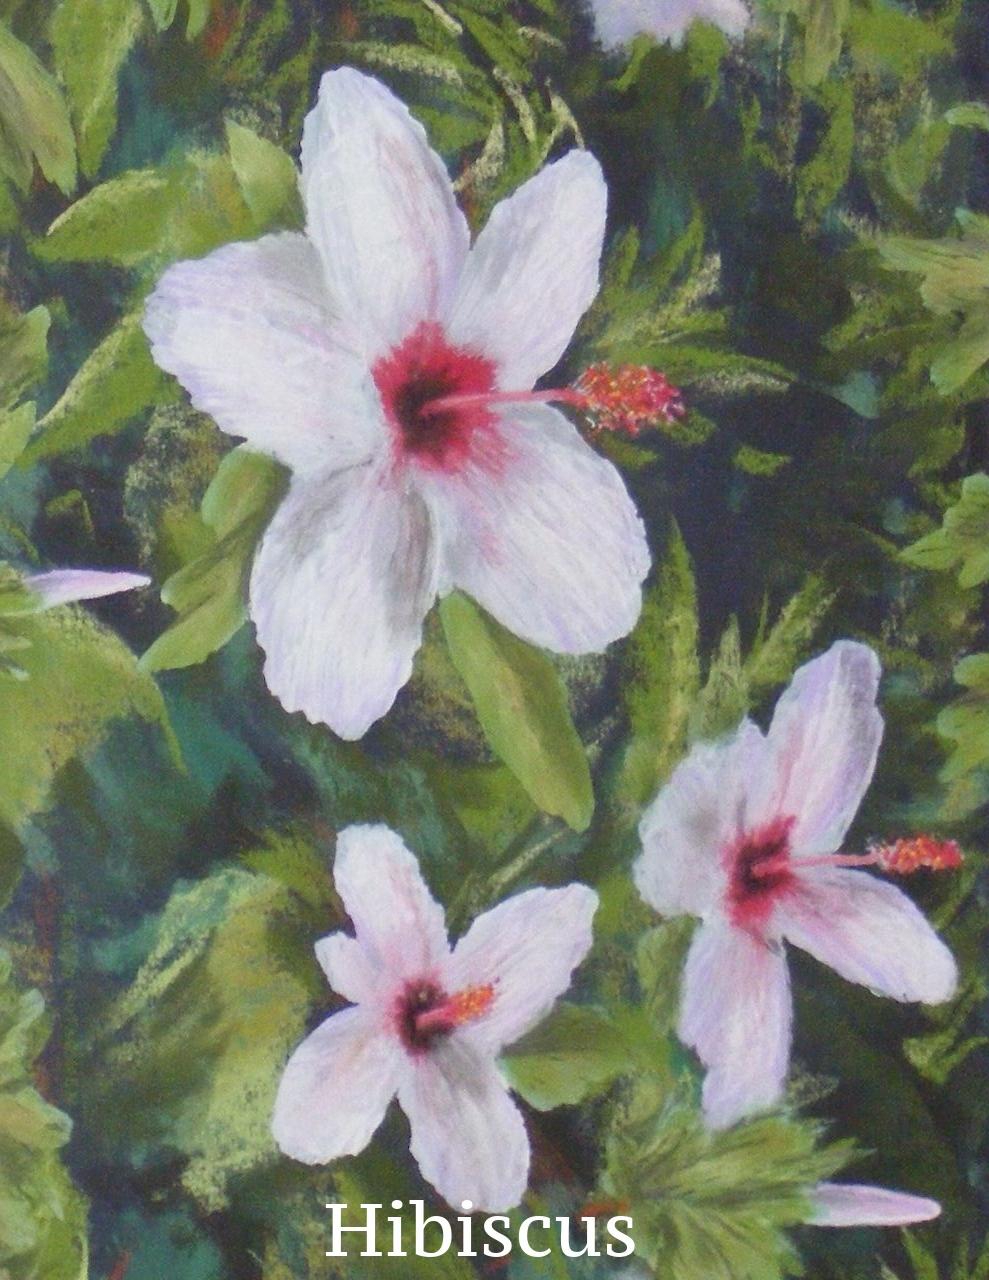 DSCF1597 Hibiscus.jpg